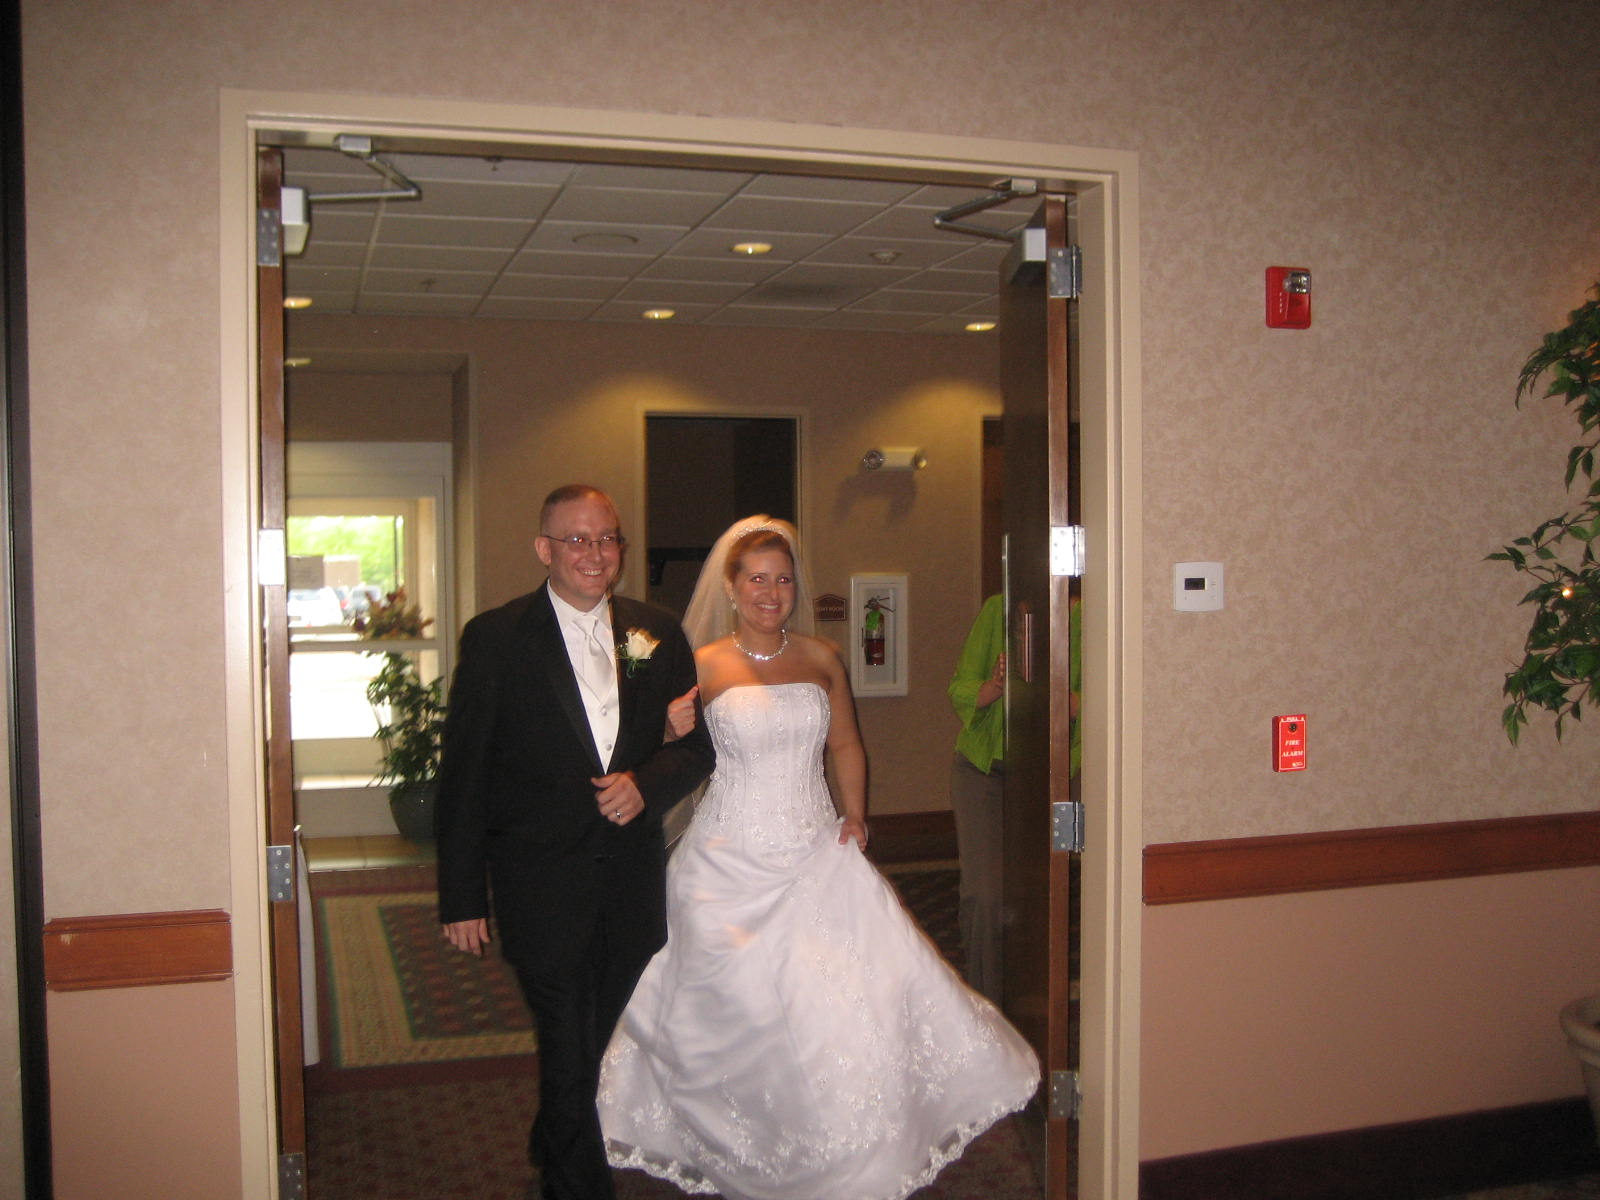 [Pete+&+Desire'+Wedding+021.jpg]